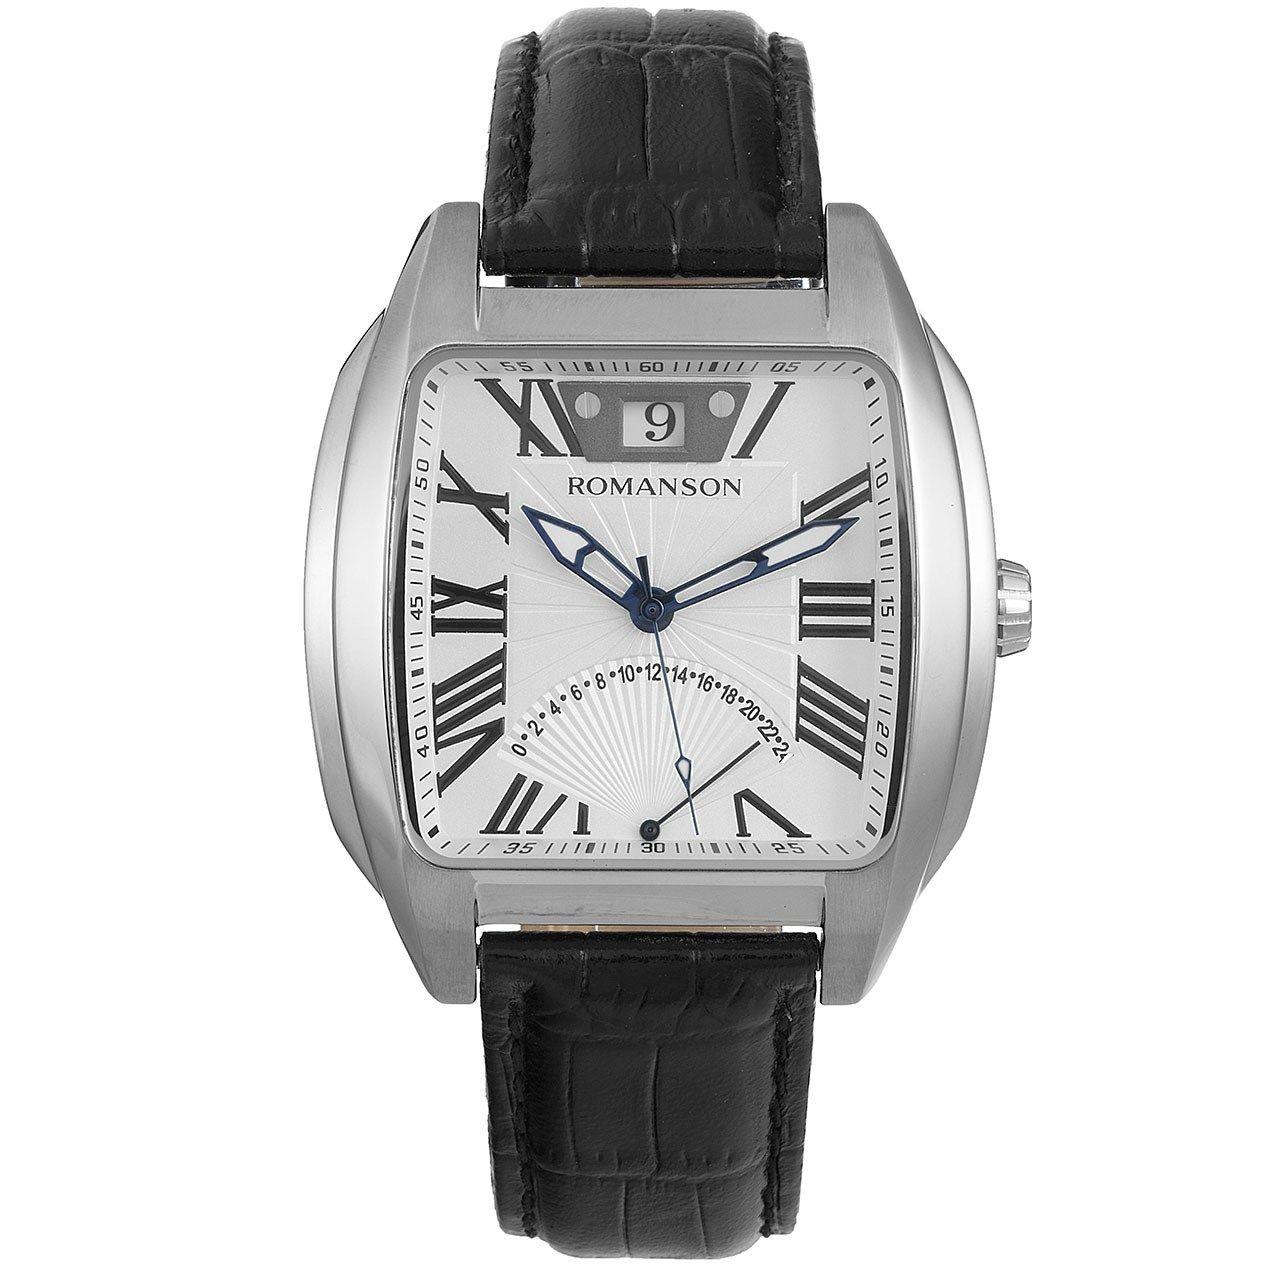 ساعت مچی عقربه ای مردانه رومانسون مدل TL1273MM1WAS5U -  - 1